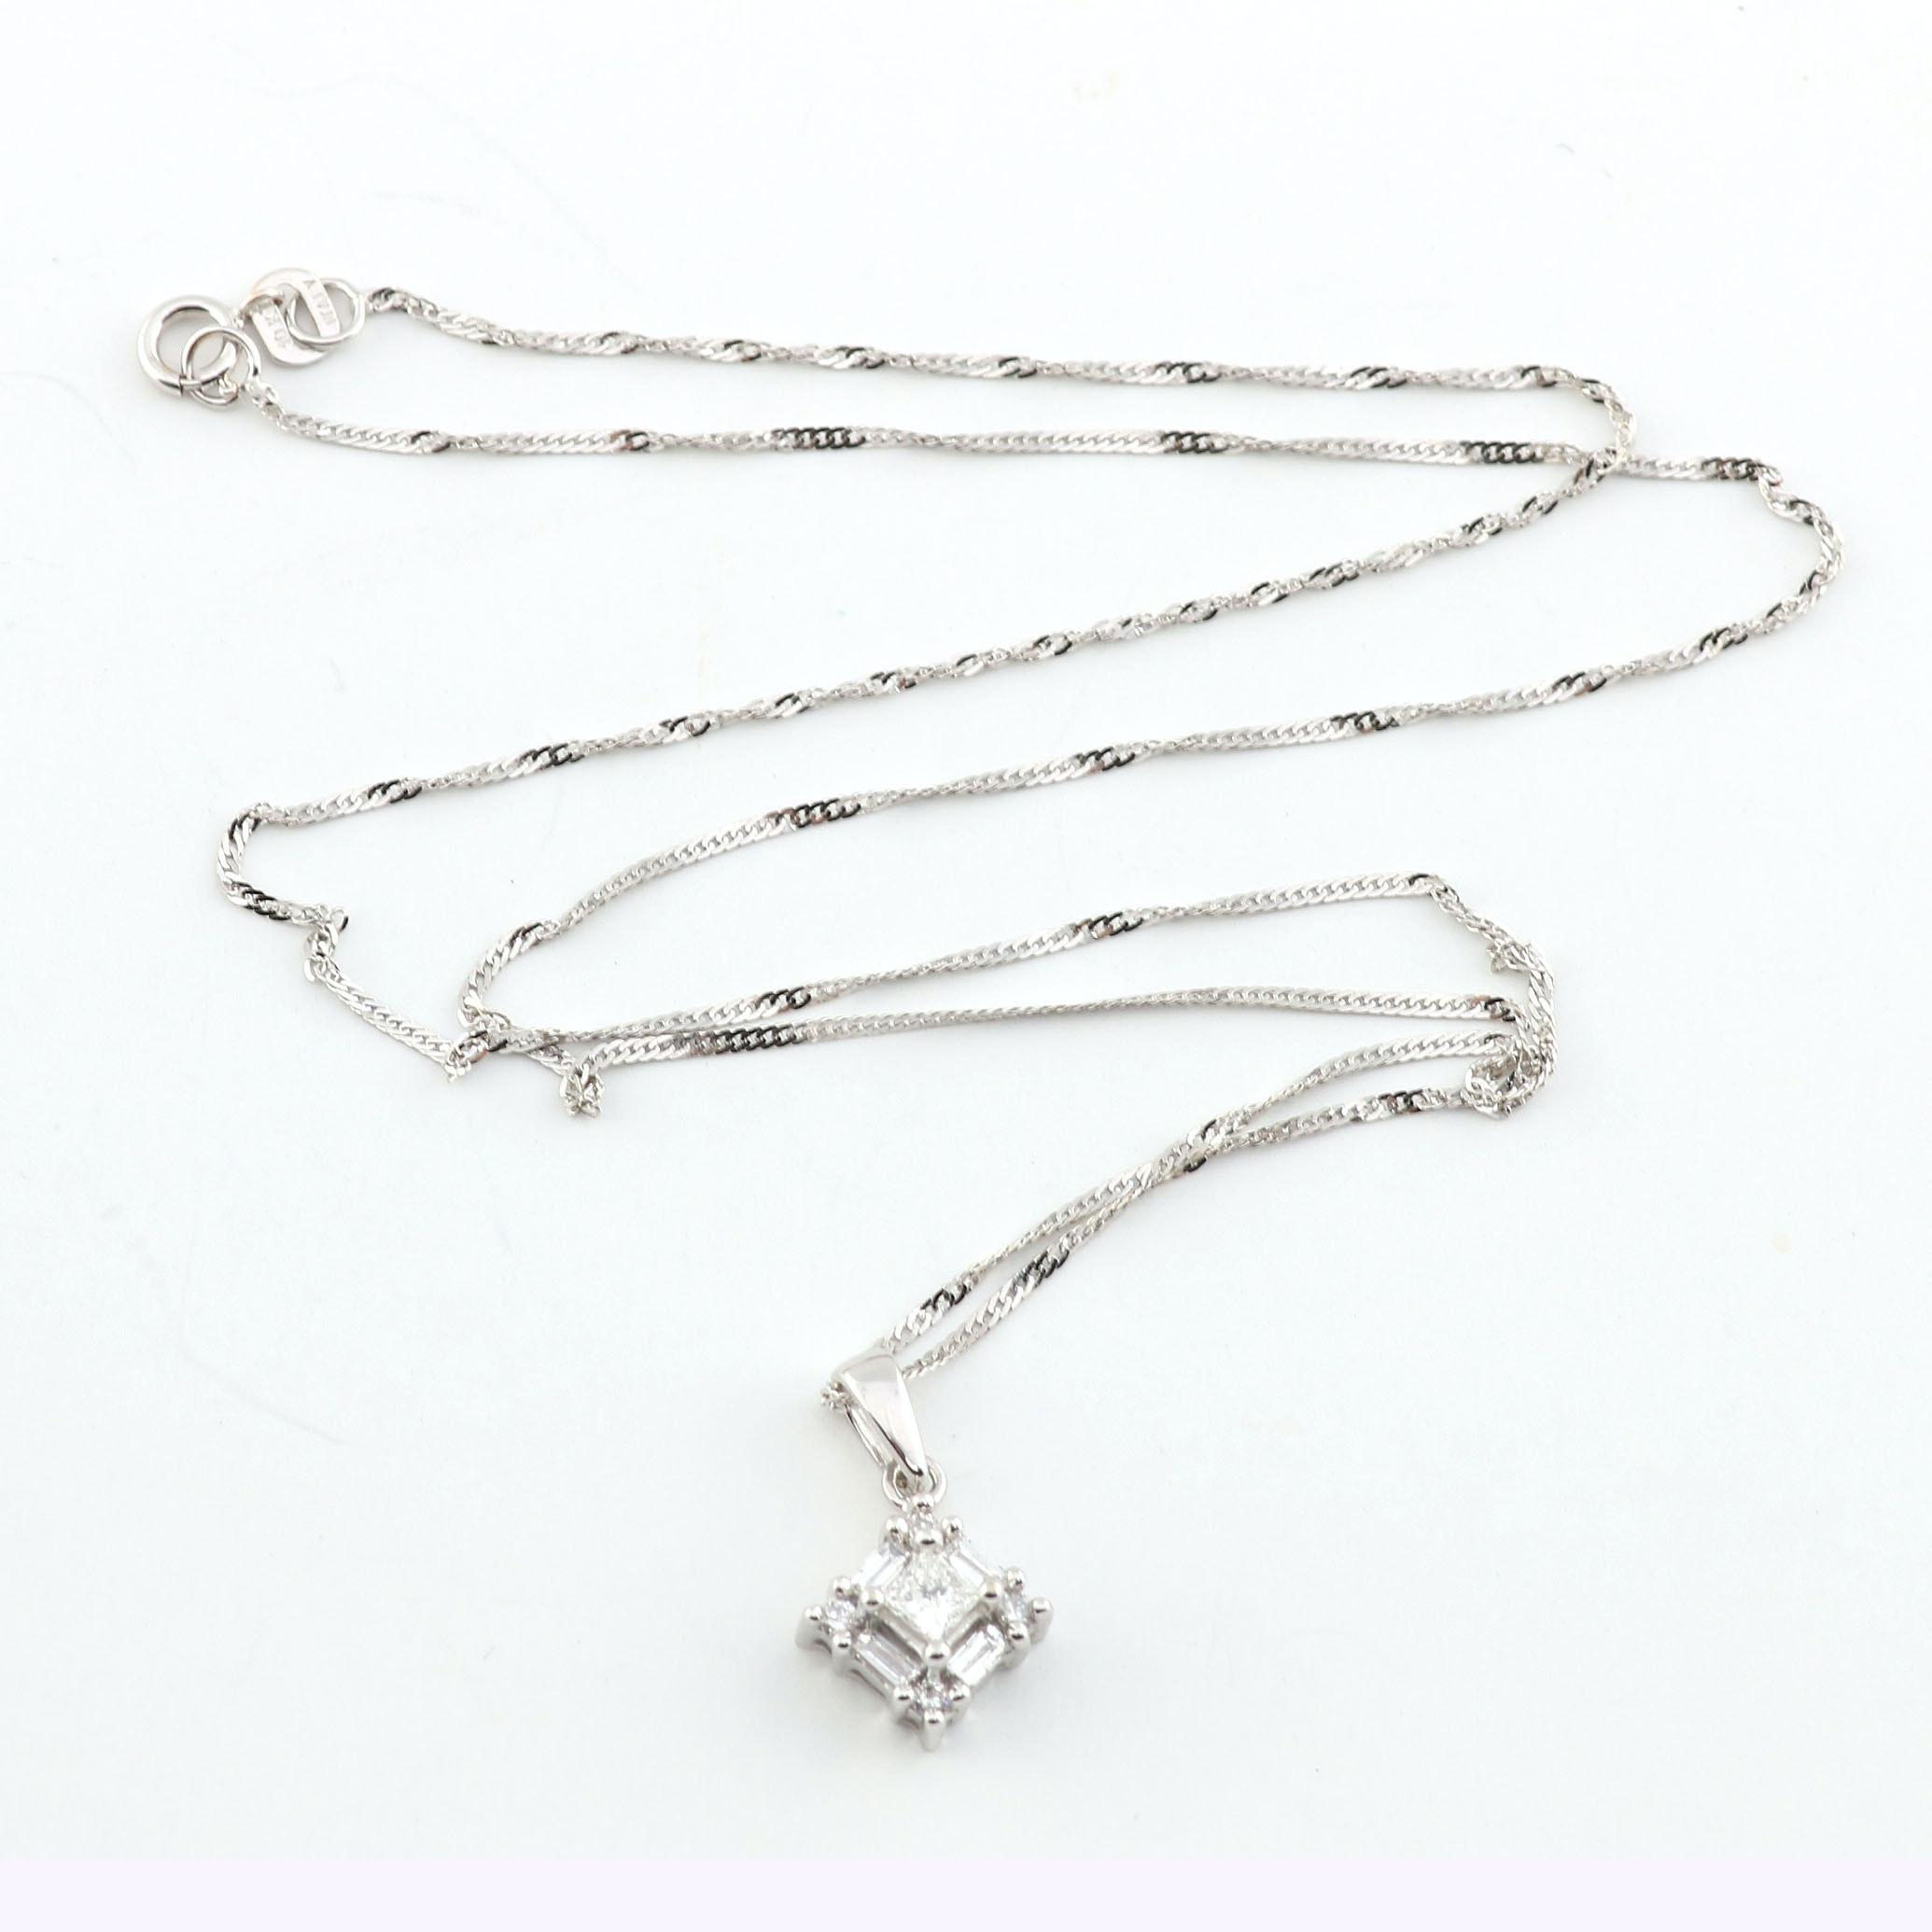 10K White Gold Chain with Diamond Pendant